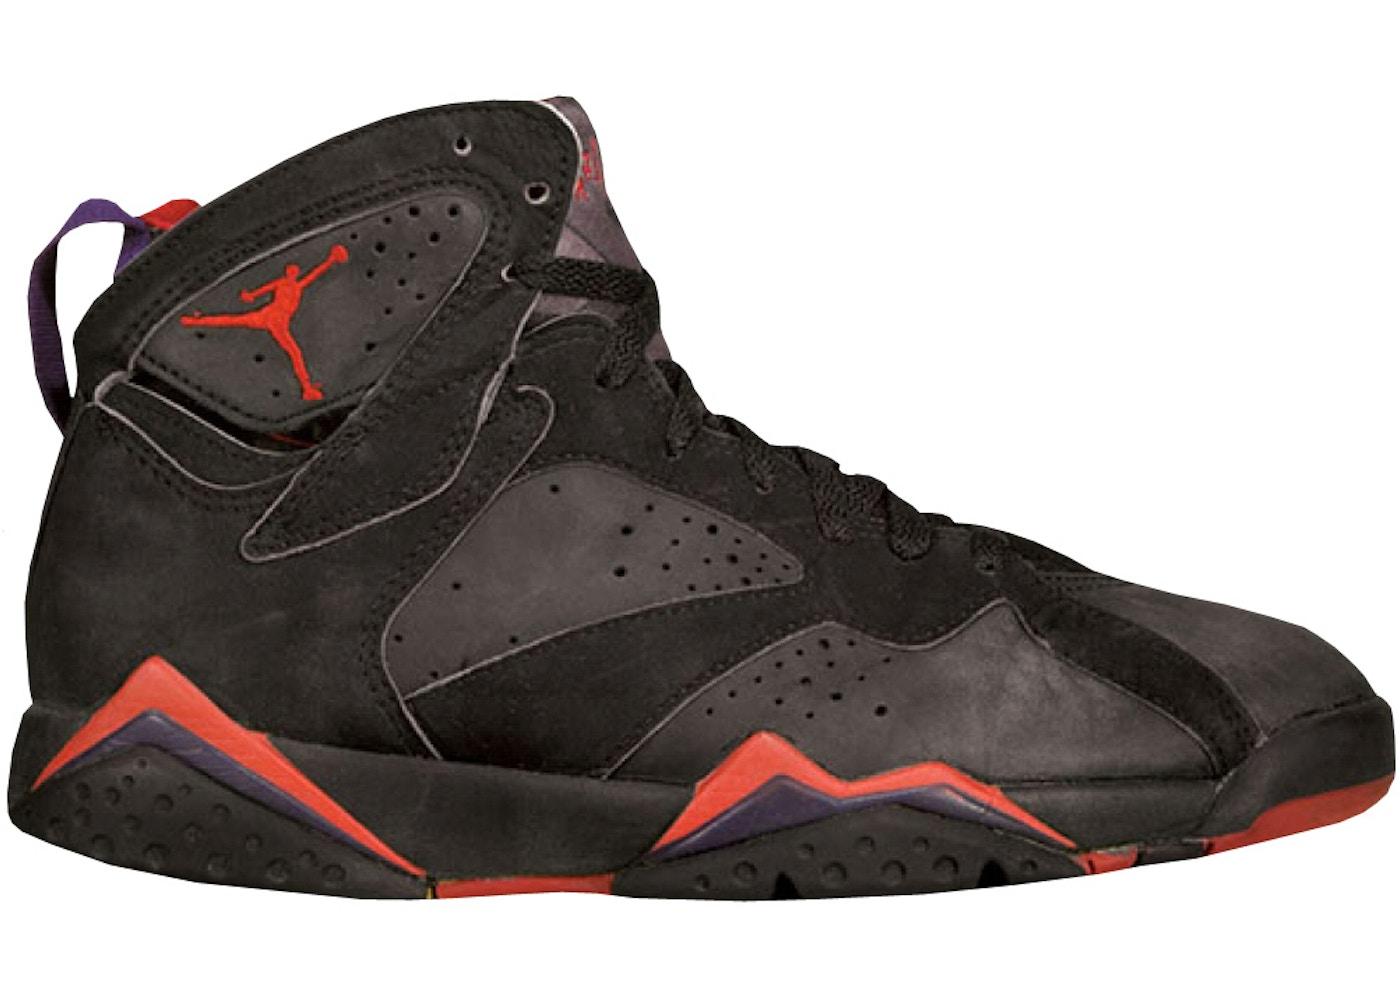 f3eeddcc4d3 Air Jordan 7 Shoes - Average Sale Price